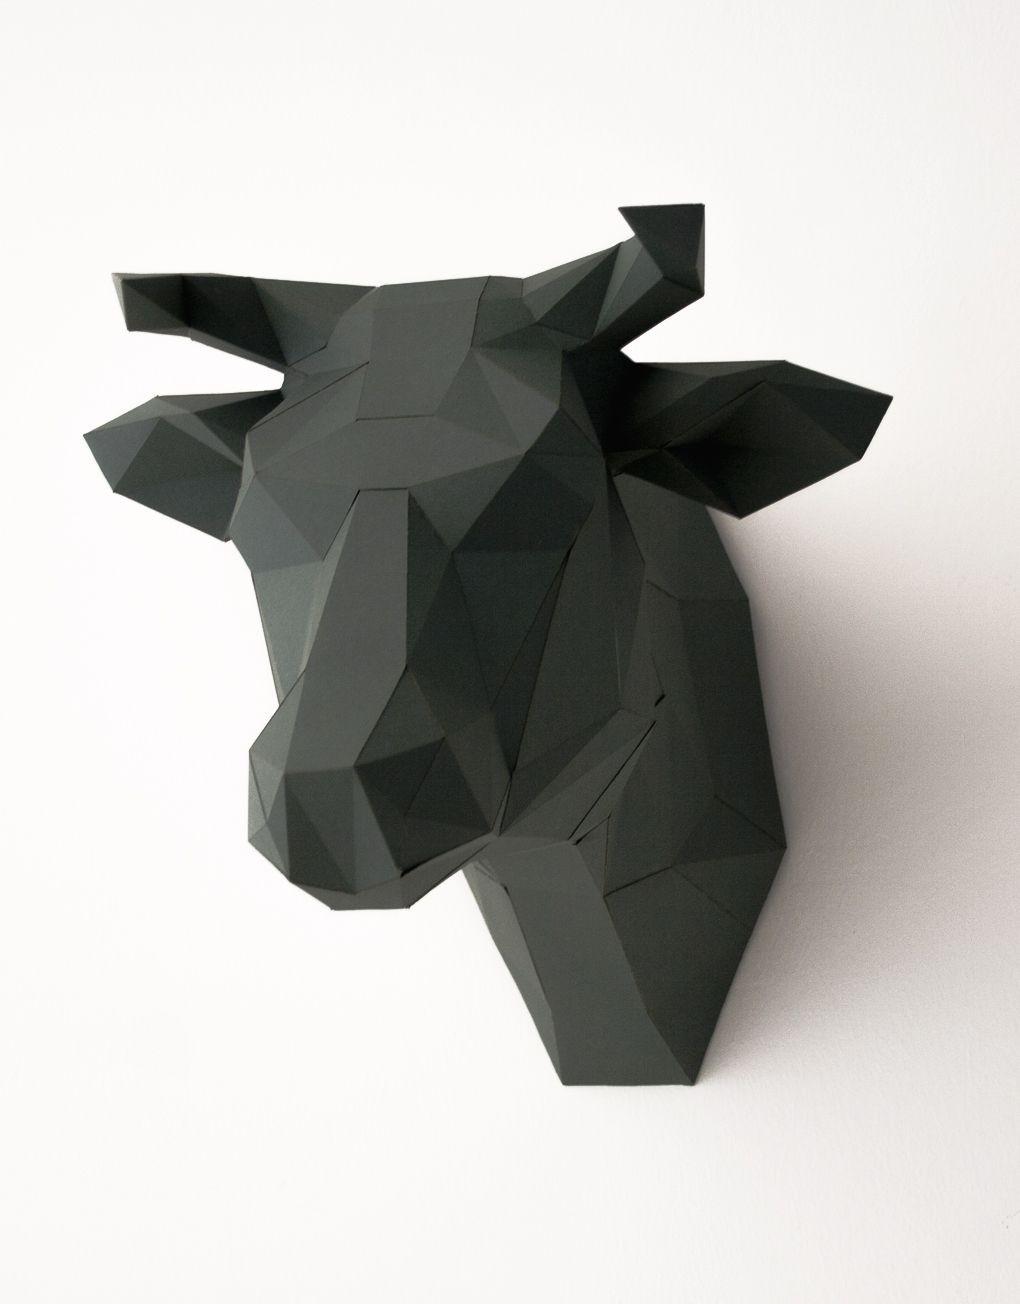 Papercraft Cow Bastelset Papier Trophäe Kuhkopf